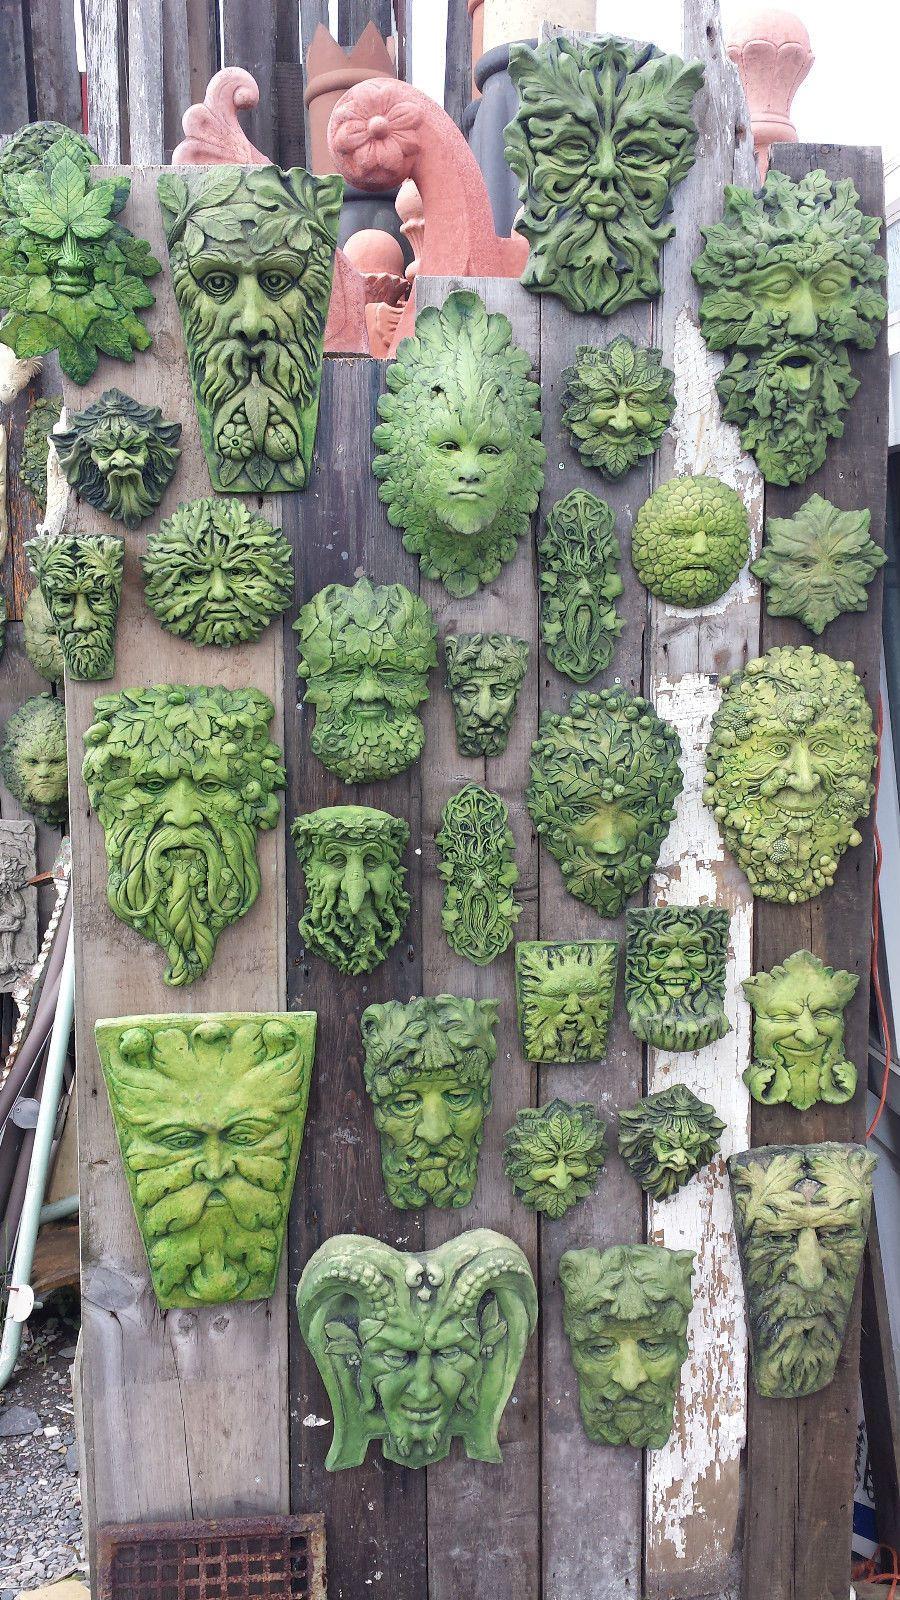 Green Man Decorative Garden Wall Ornaments Plaques Pagan / Wiccan ...